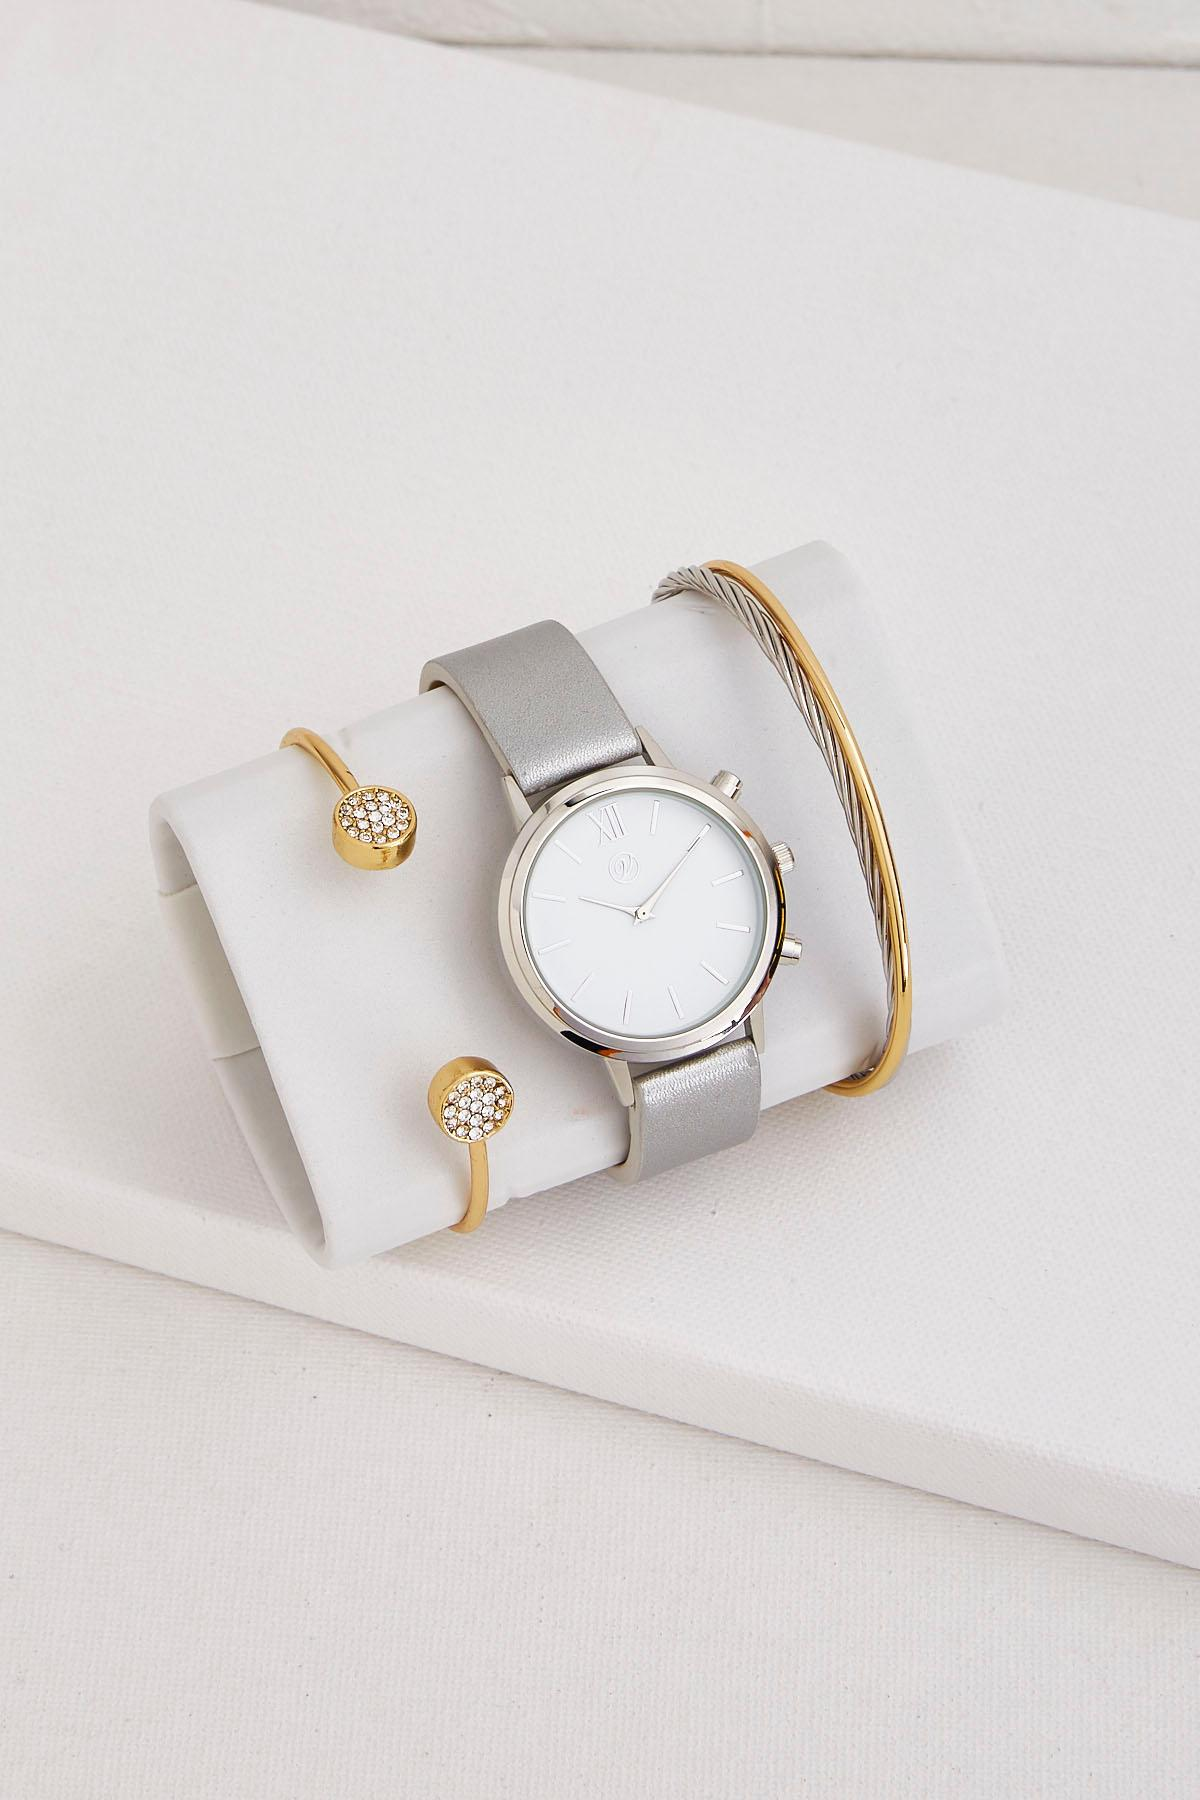 Watch Bracelet Gift Set